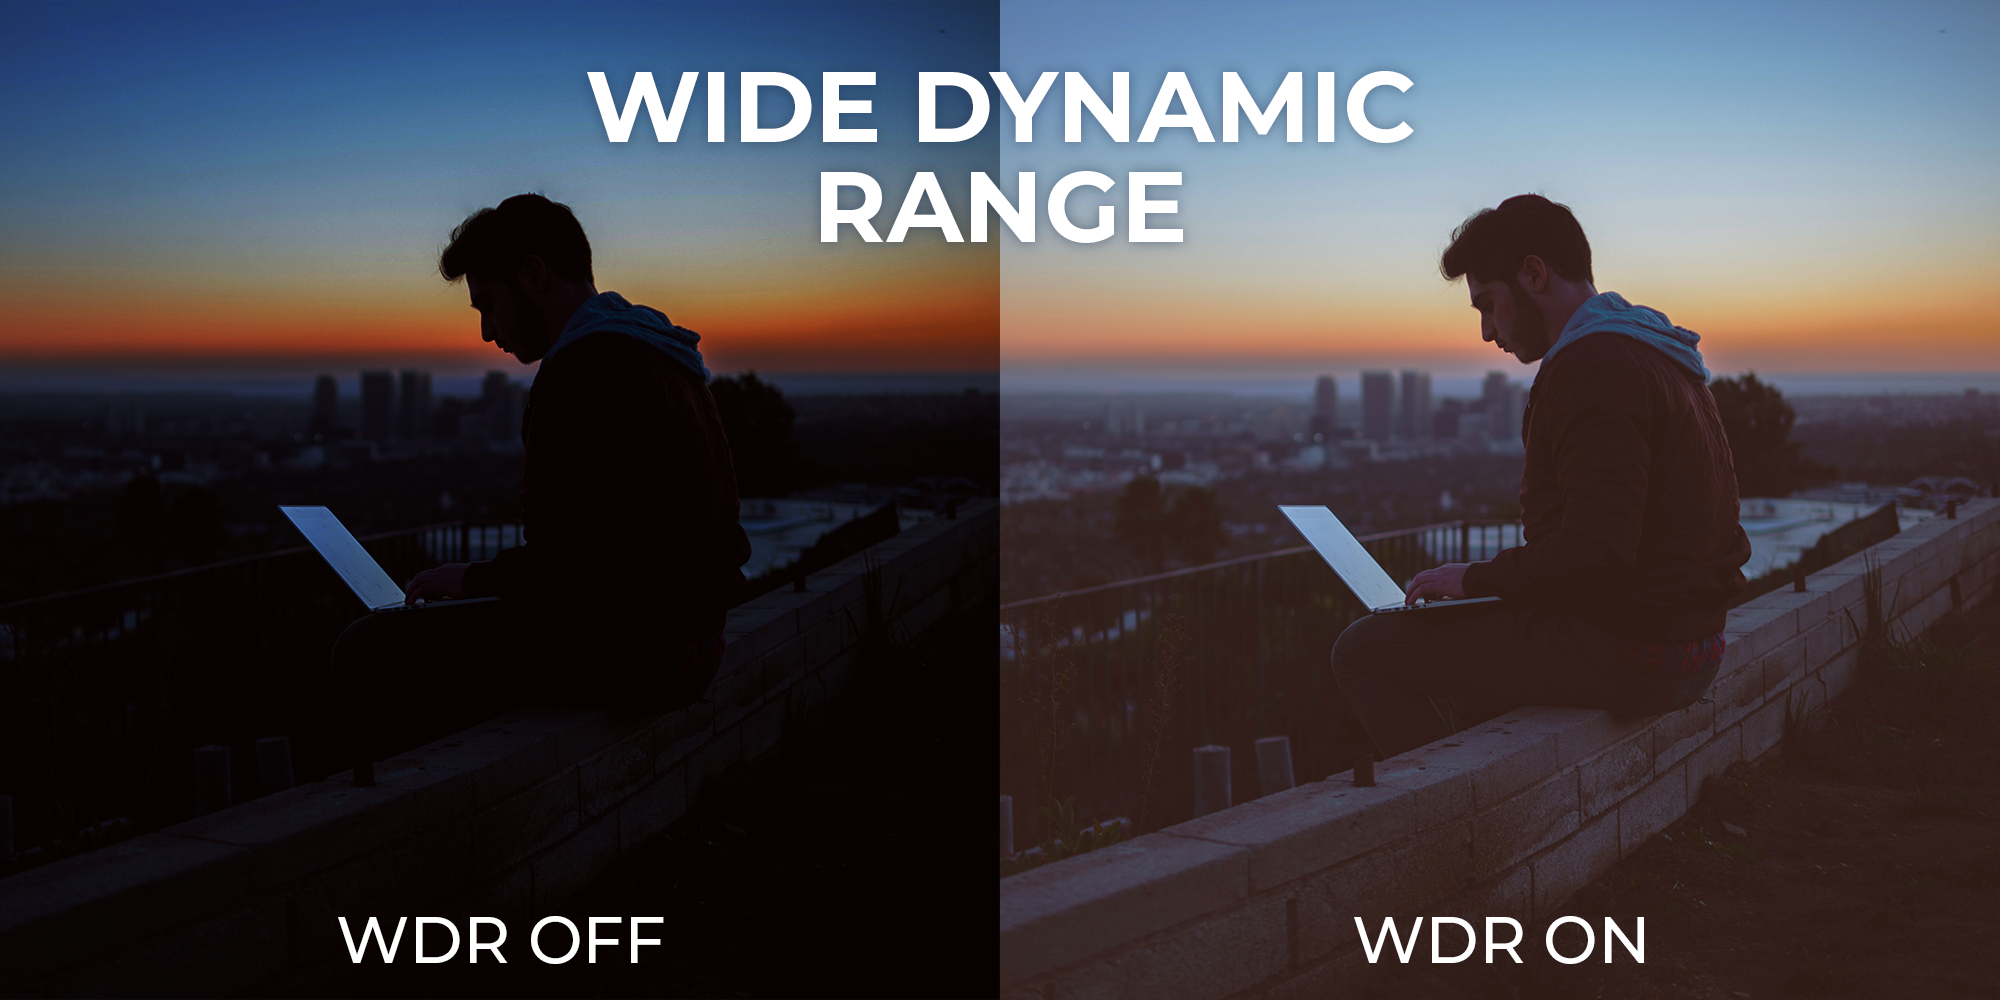 WDR (Wide Dynamic Range) - Infinity